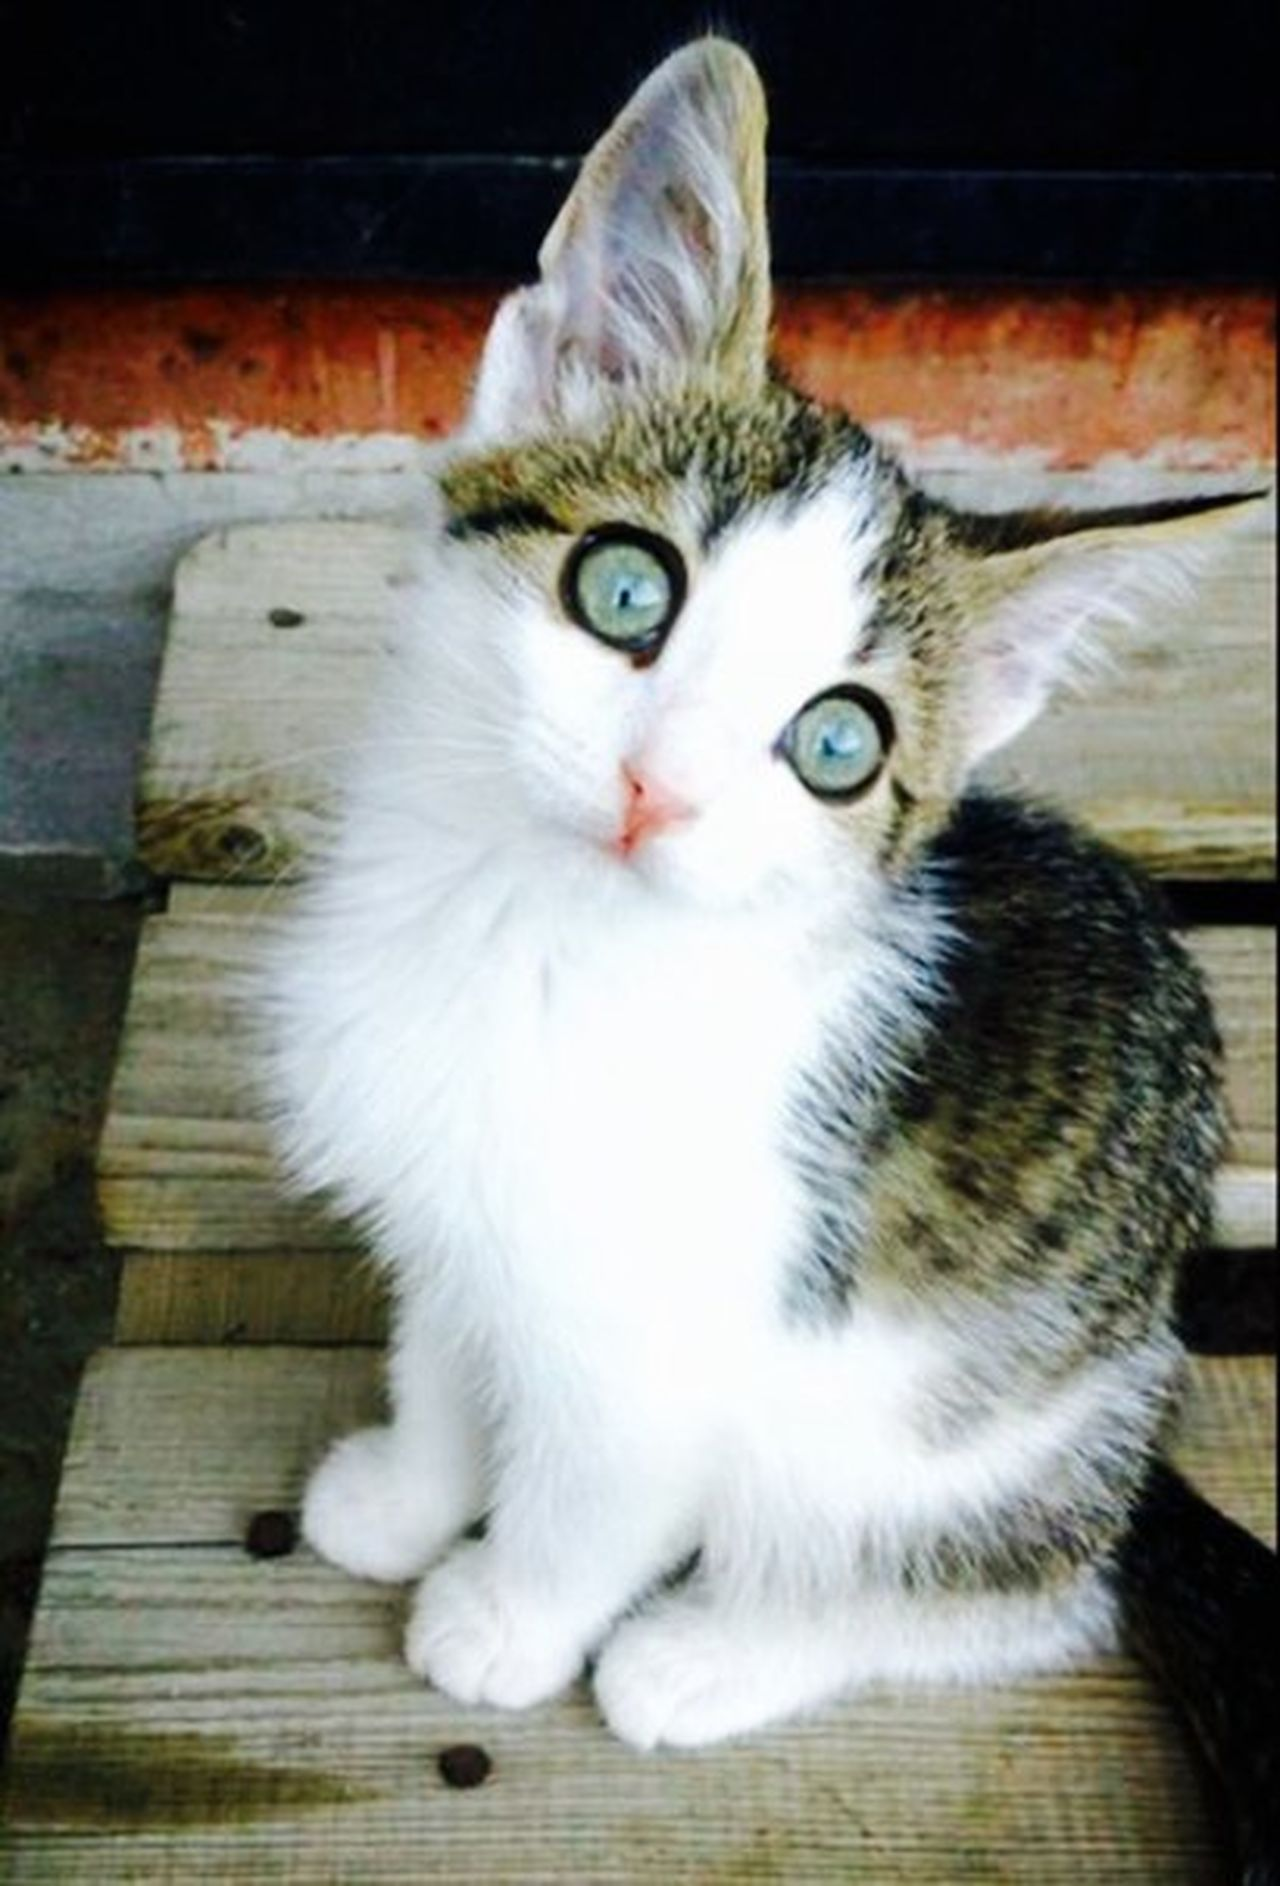 кот Котик красота красавец чудо💏💑💗 лапуля красавчики милота😊 котэ